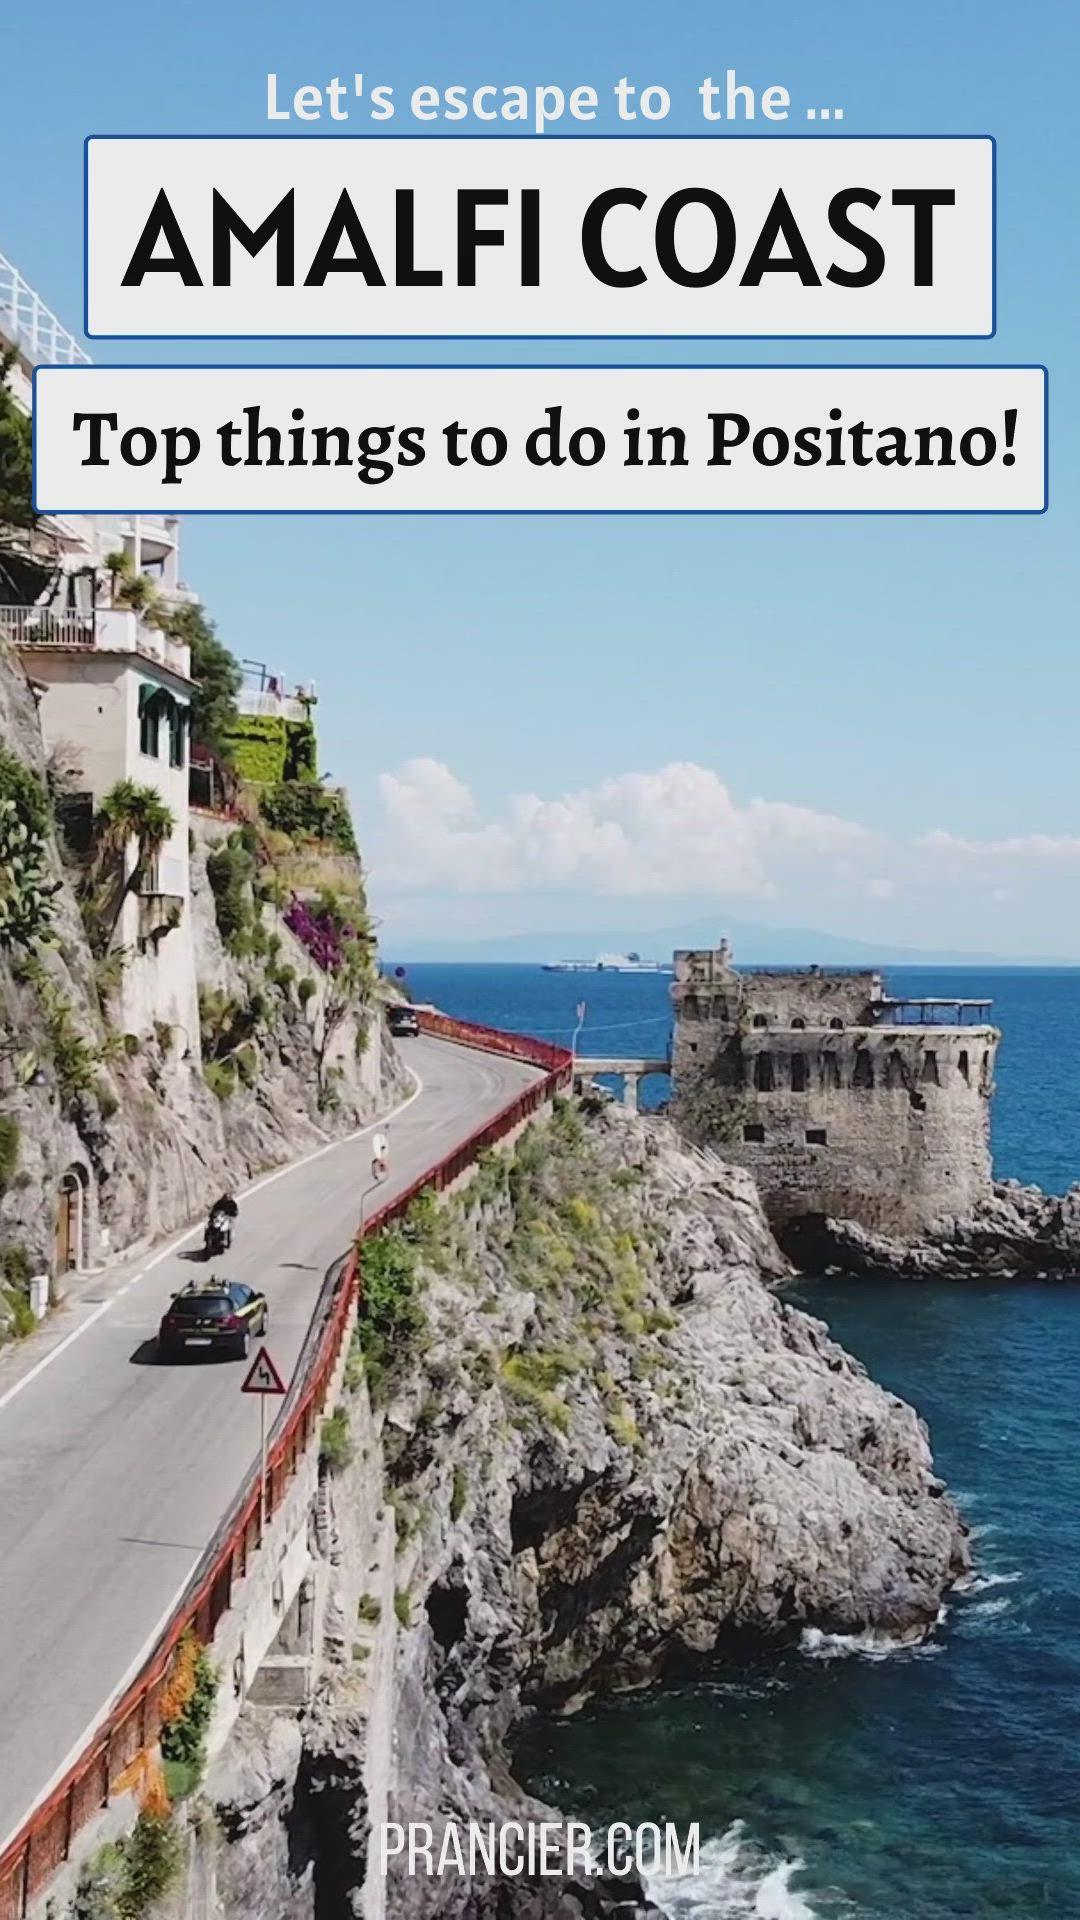 How To Get Around Amalfi Coast Without A Car